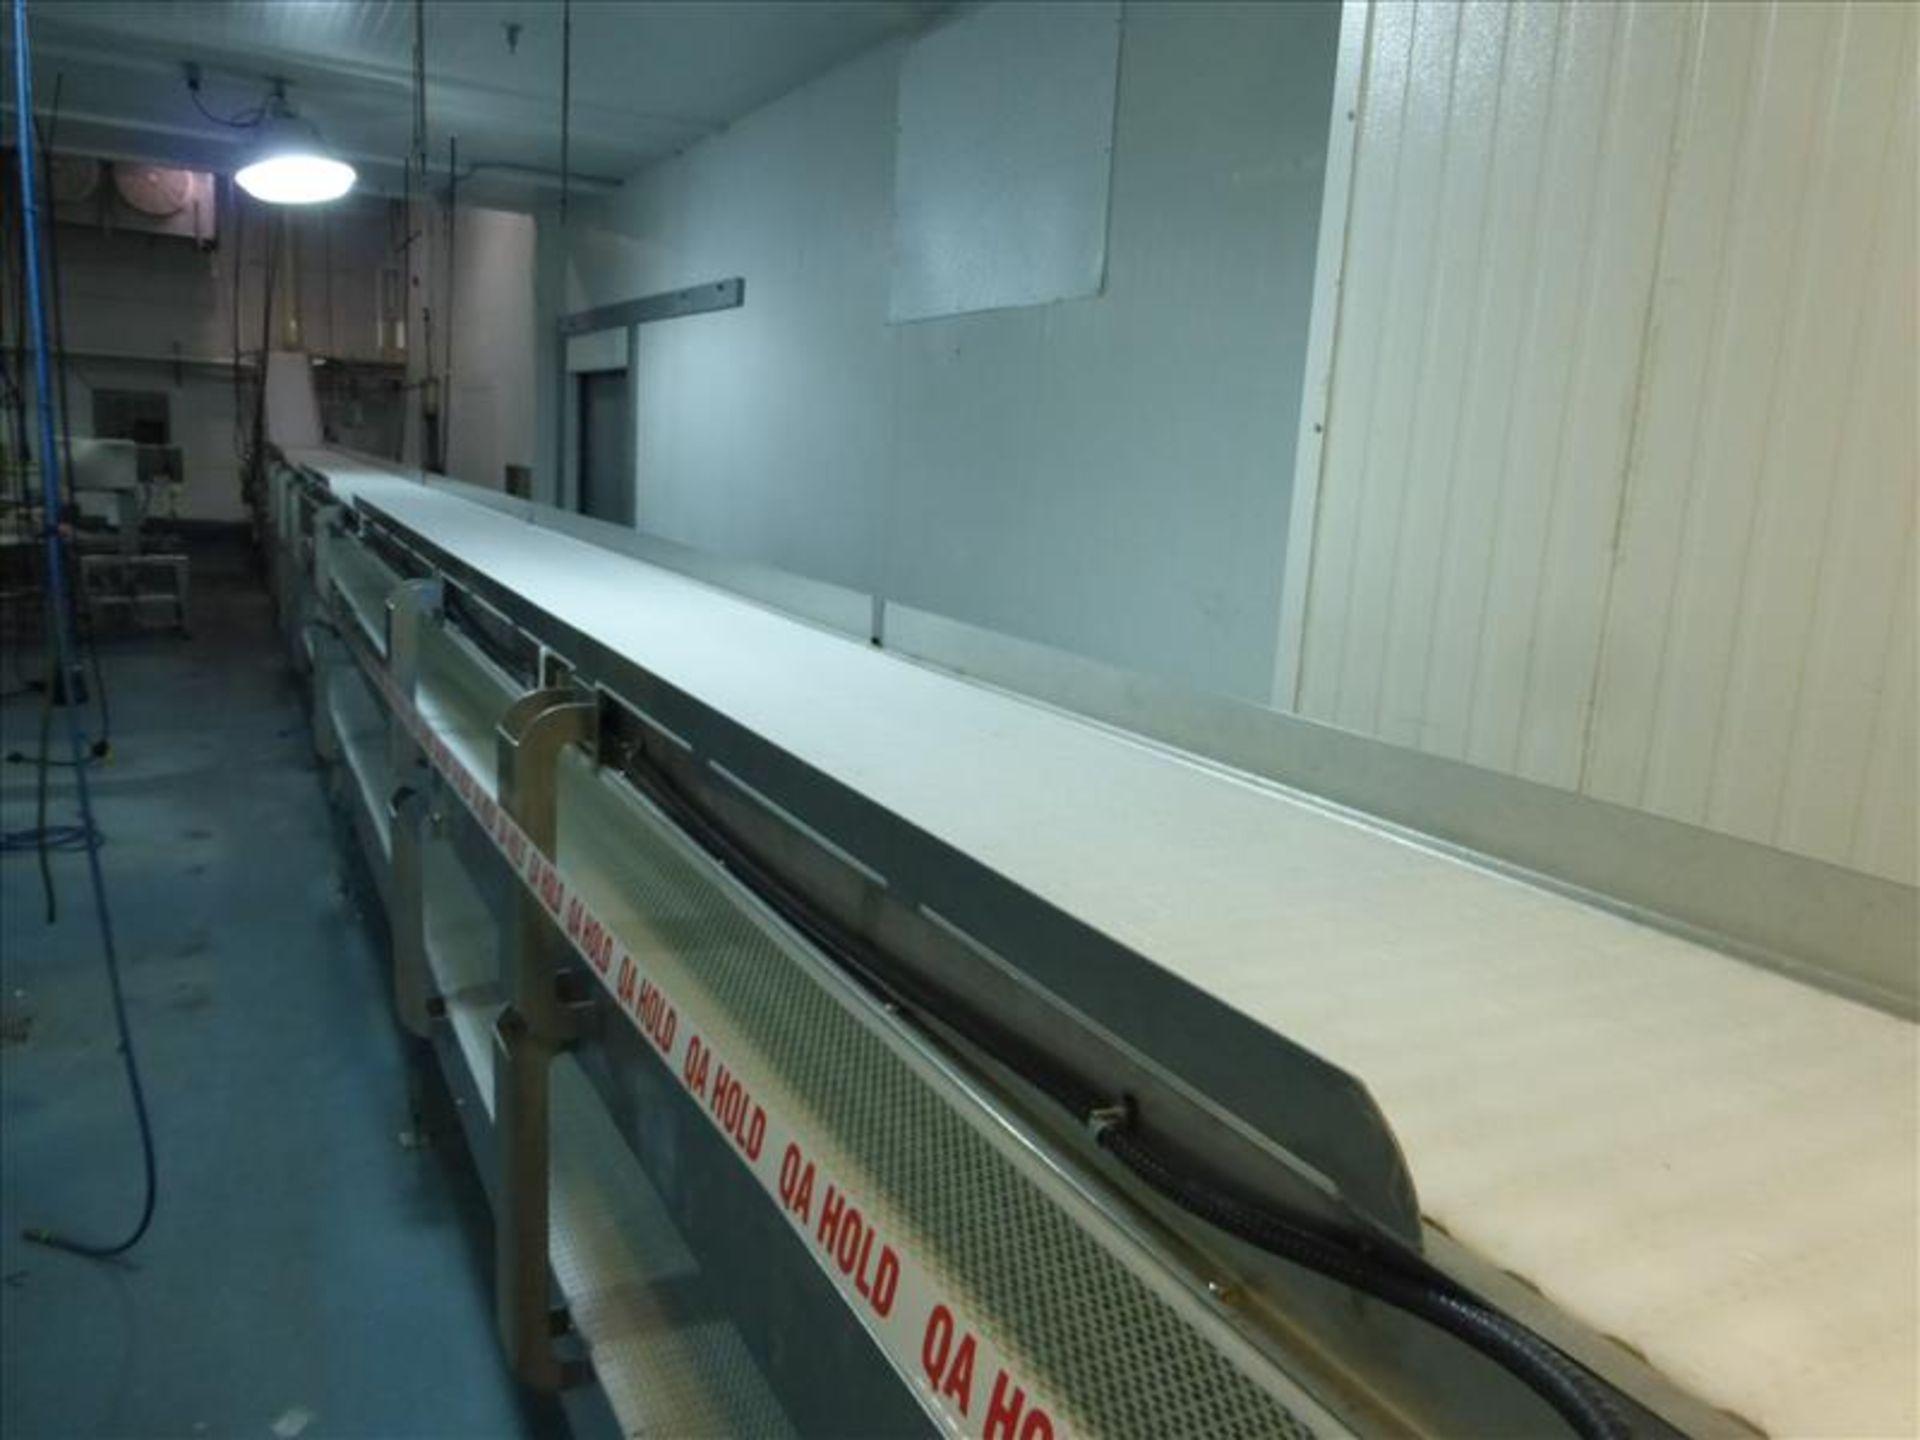 Lot 101 - conveyor, s/s, powered, interlox belt, approx. 20 in. x 60 ft. (empty case conveyor)